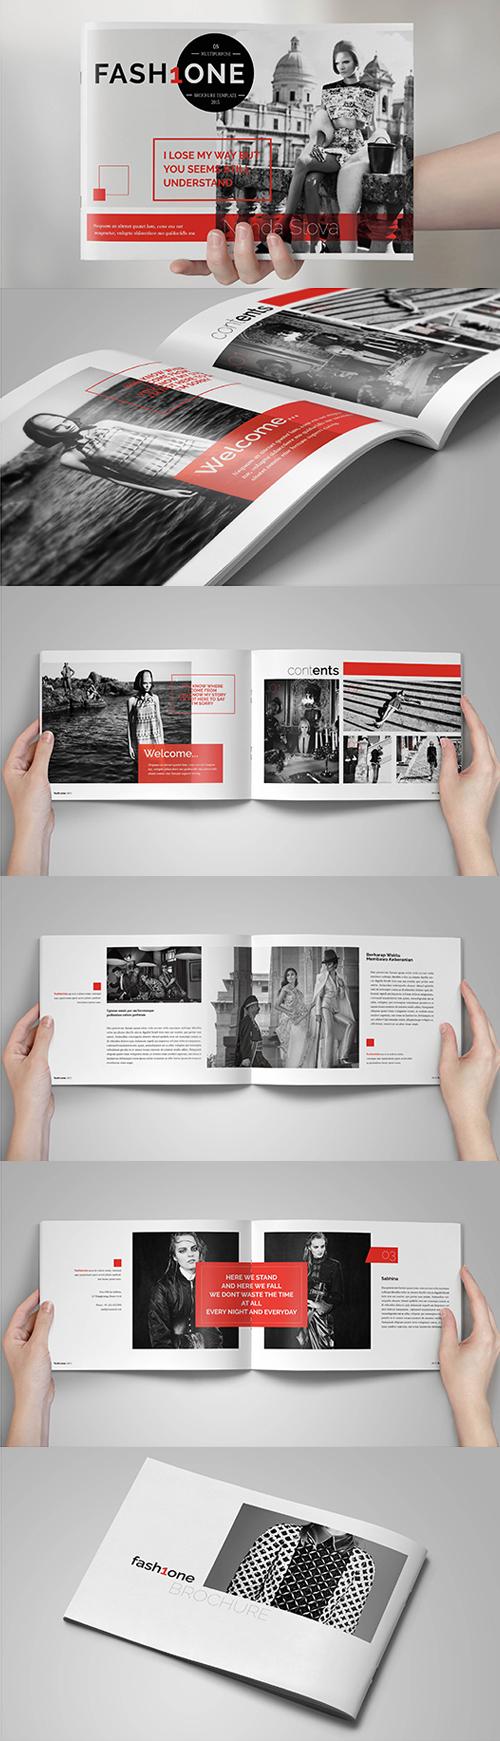 Multipurpose Fashion Brochure Template